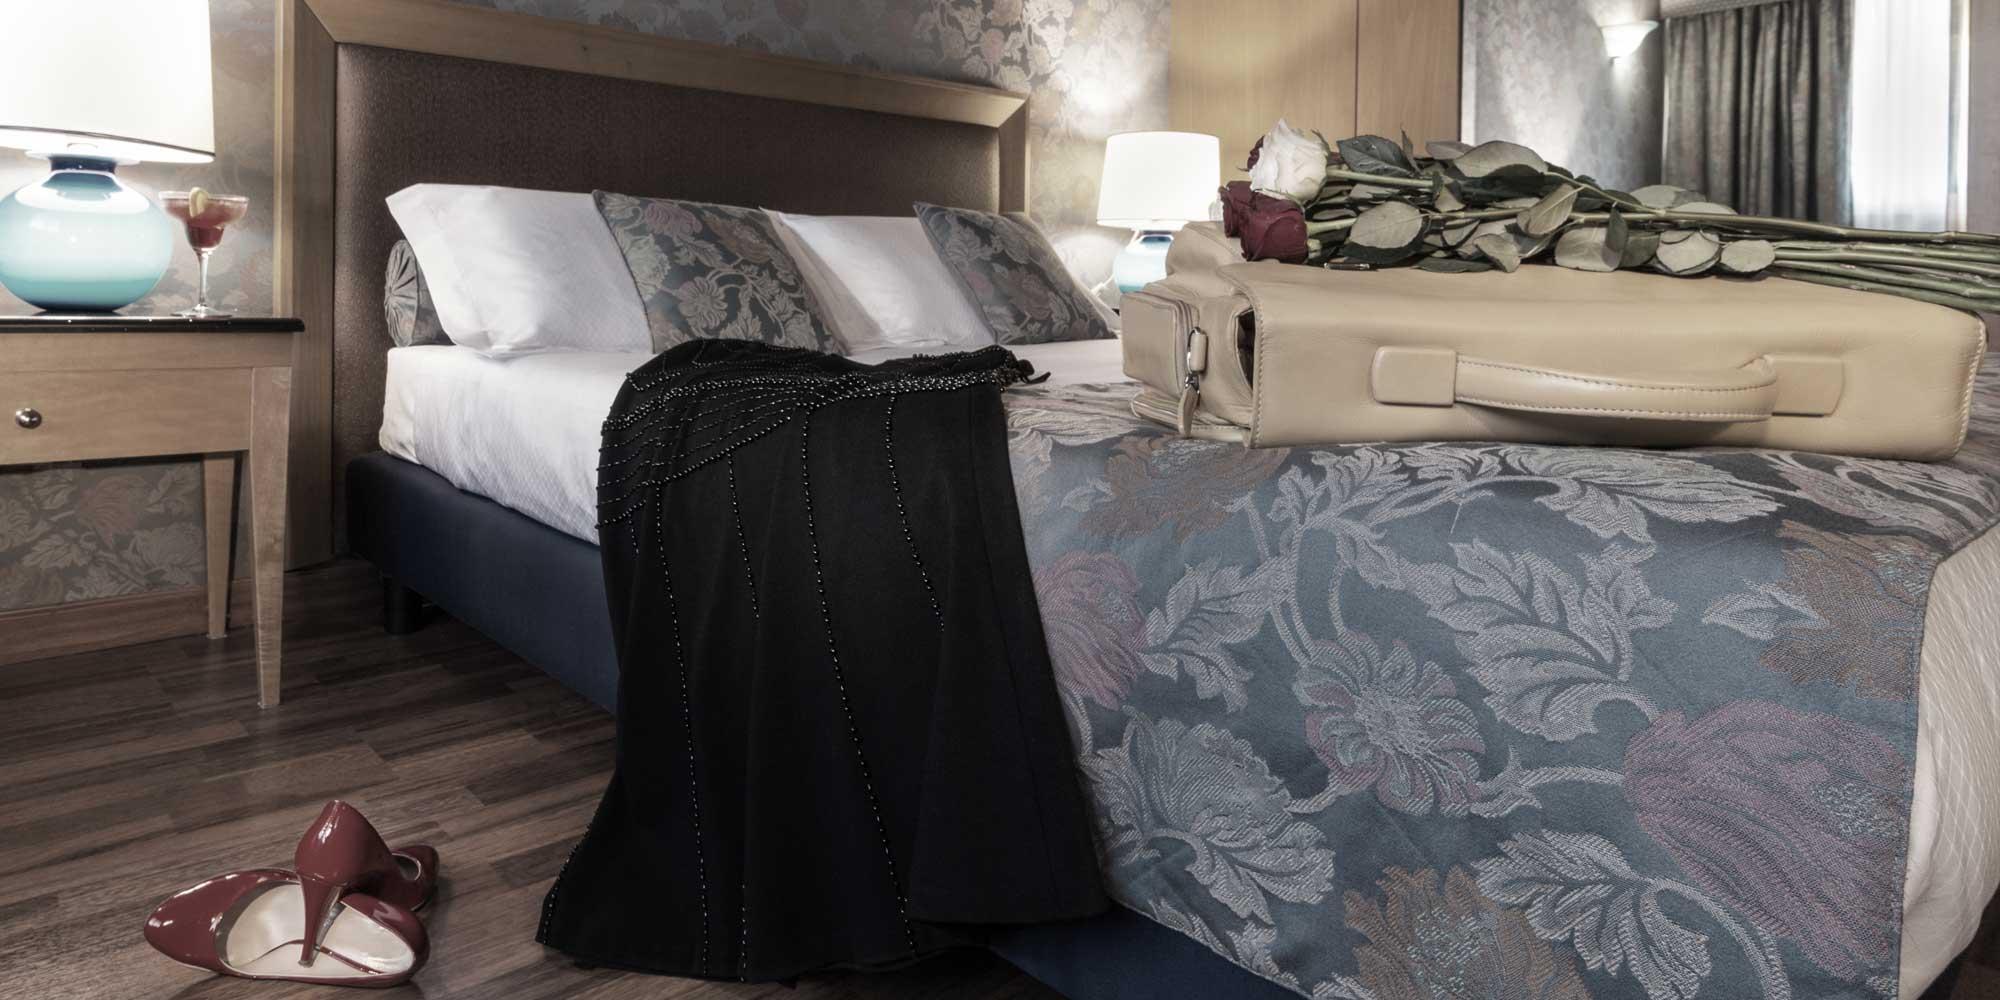 Offerta motel milano